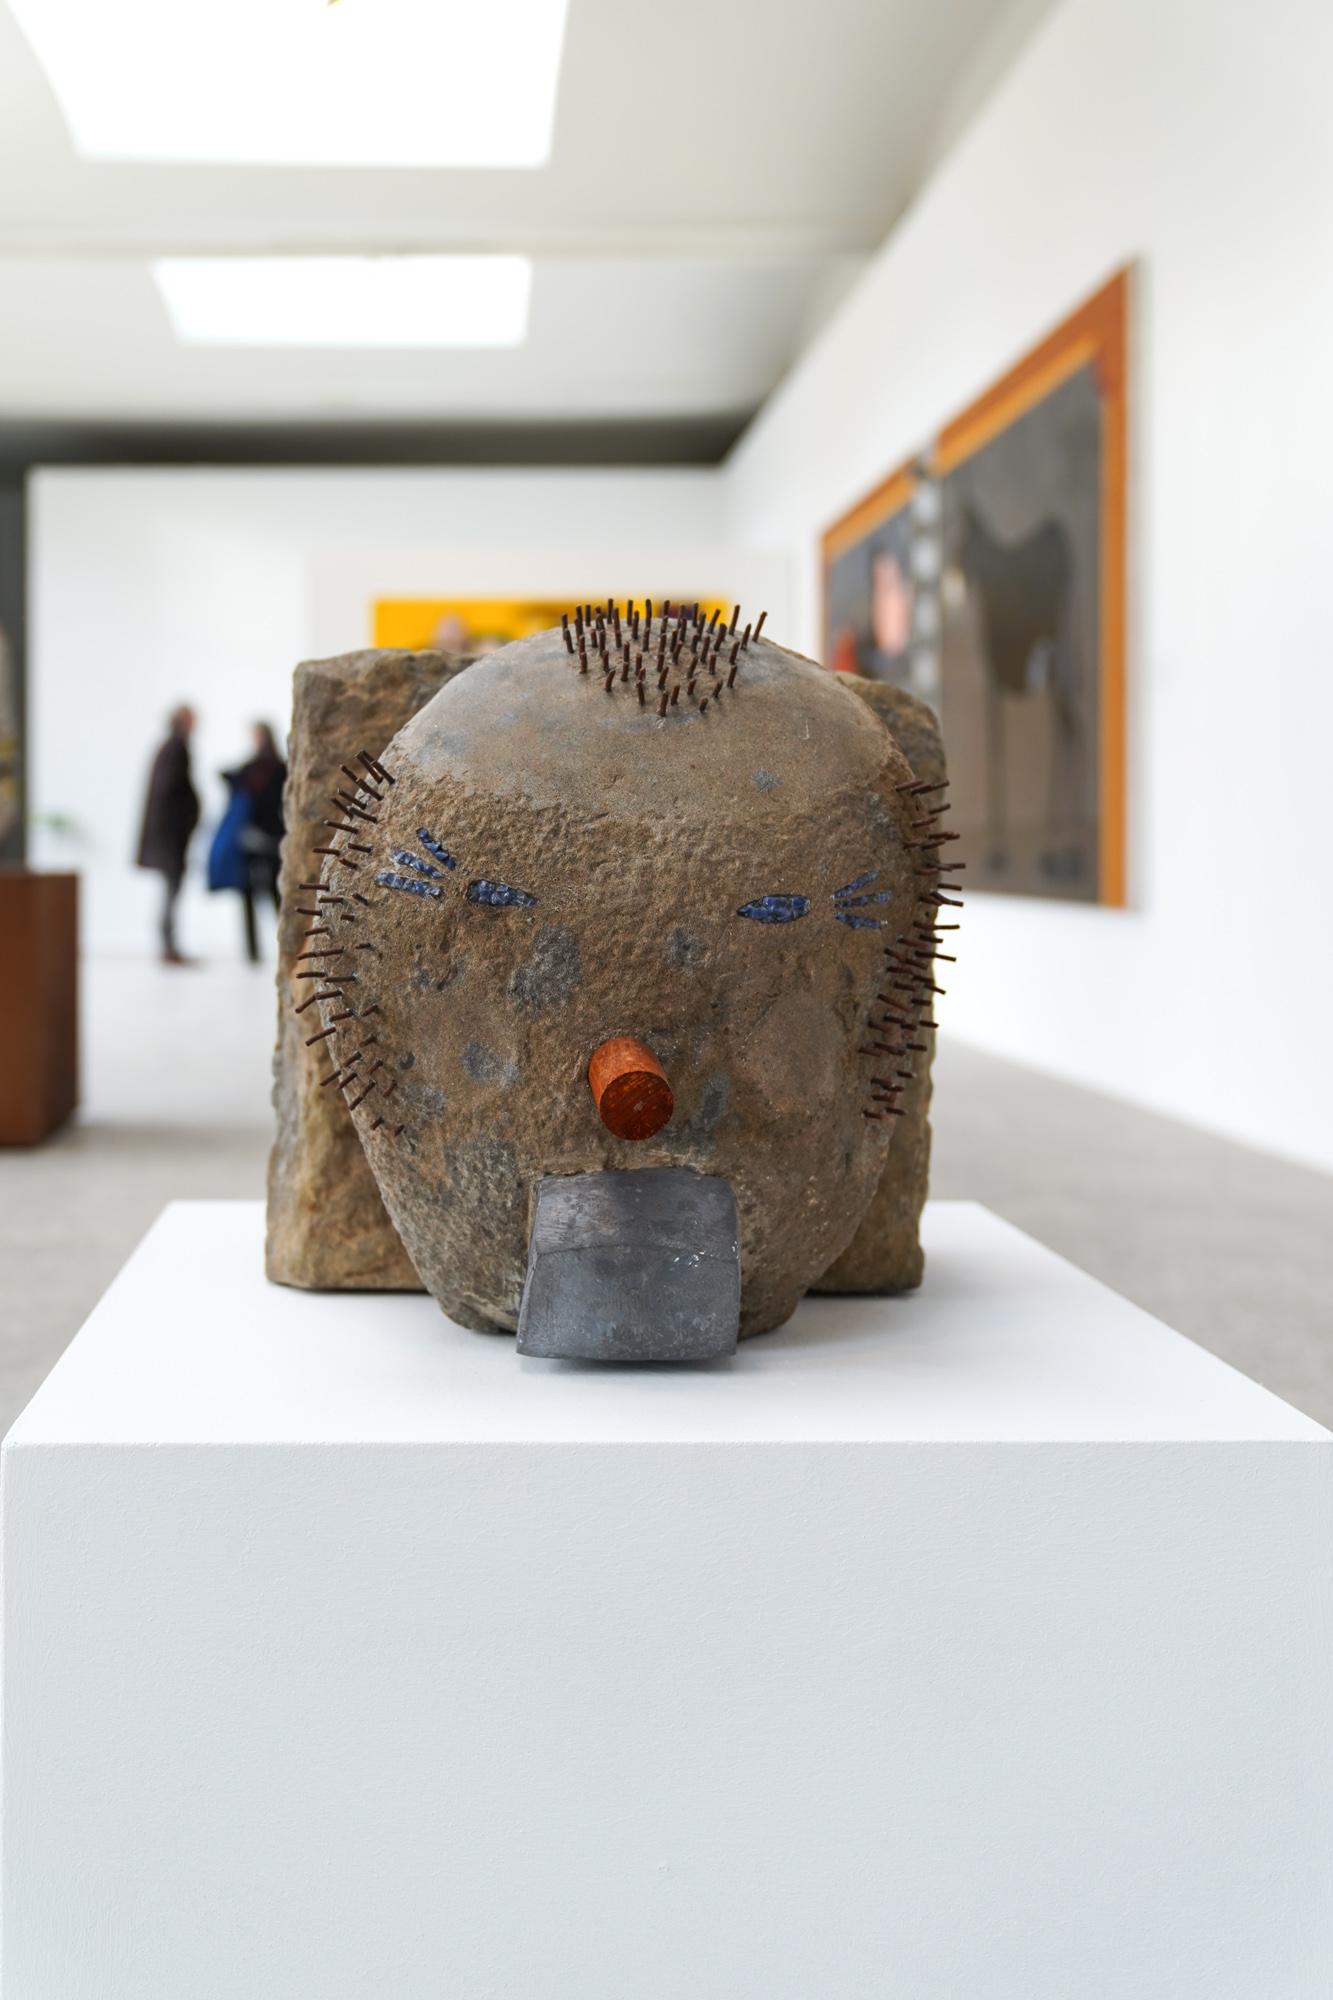 CaballeroCosmica-ExhibitionsPhoto-EduardoArroyo-12.jpg